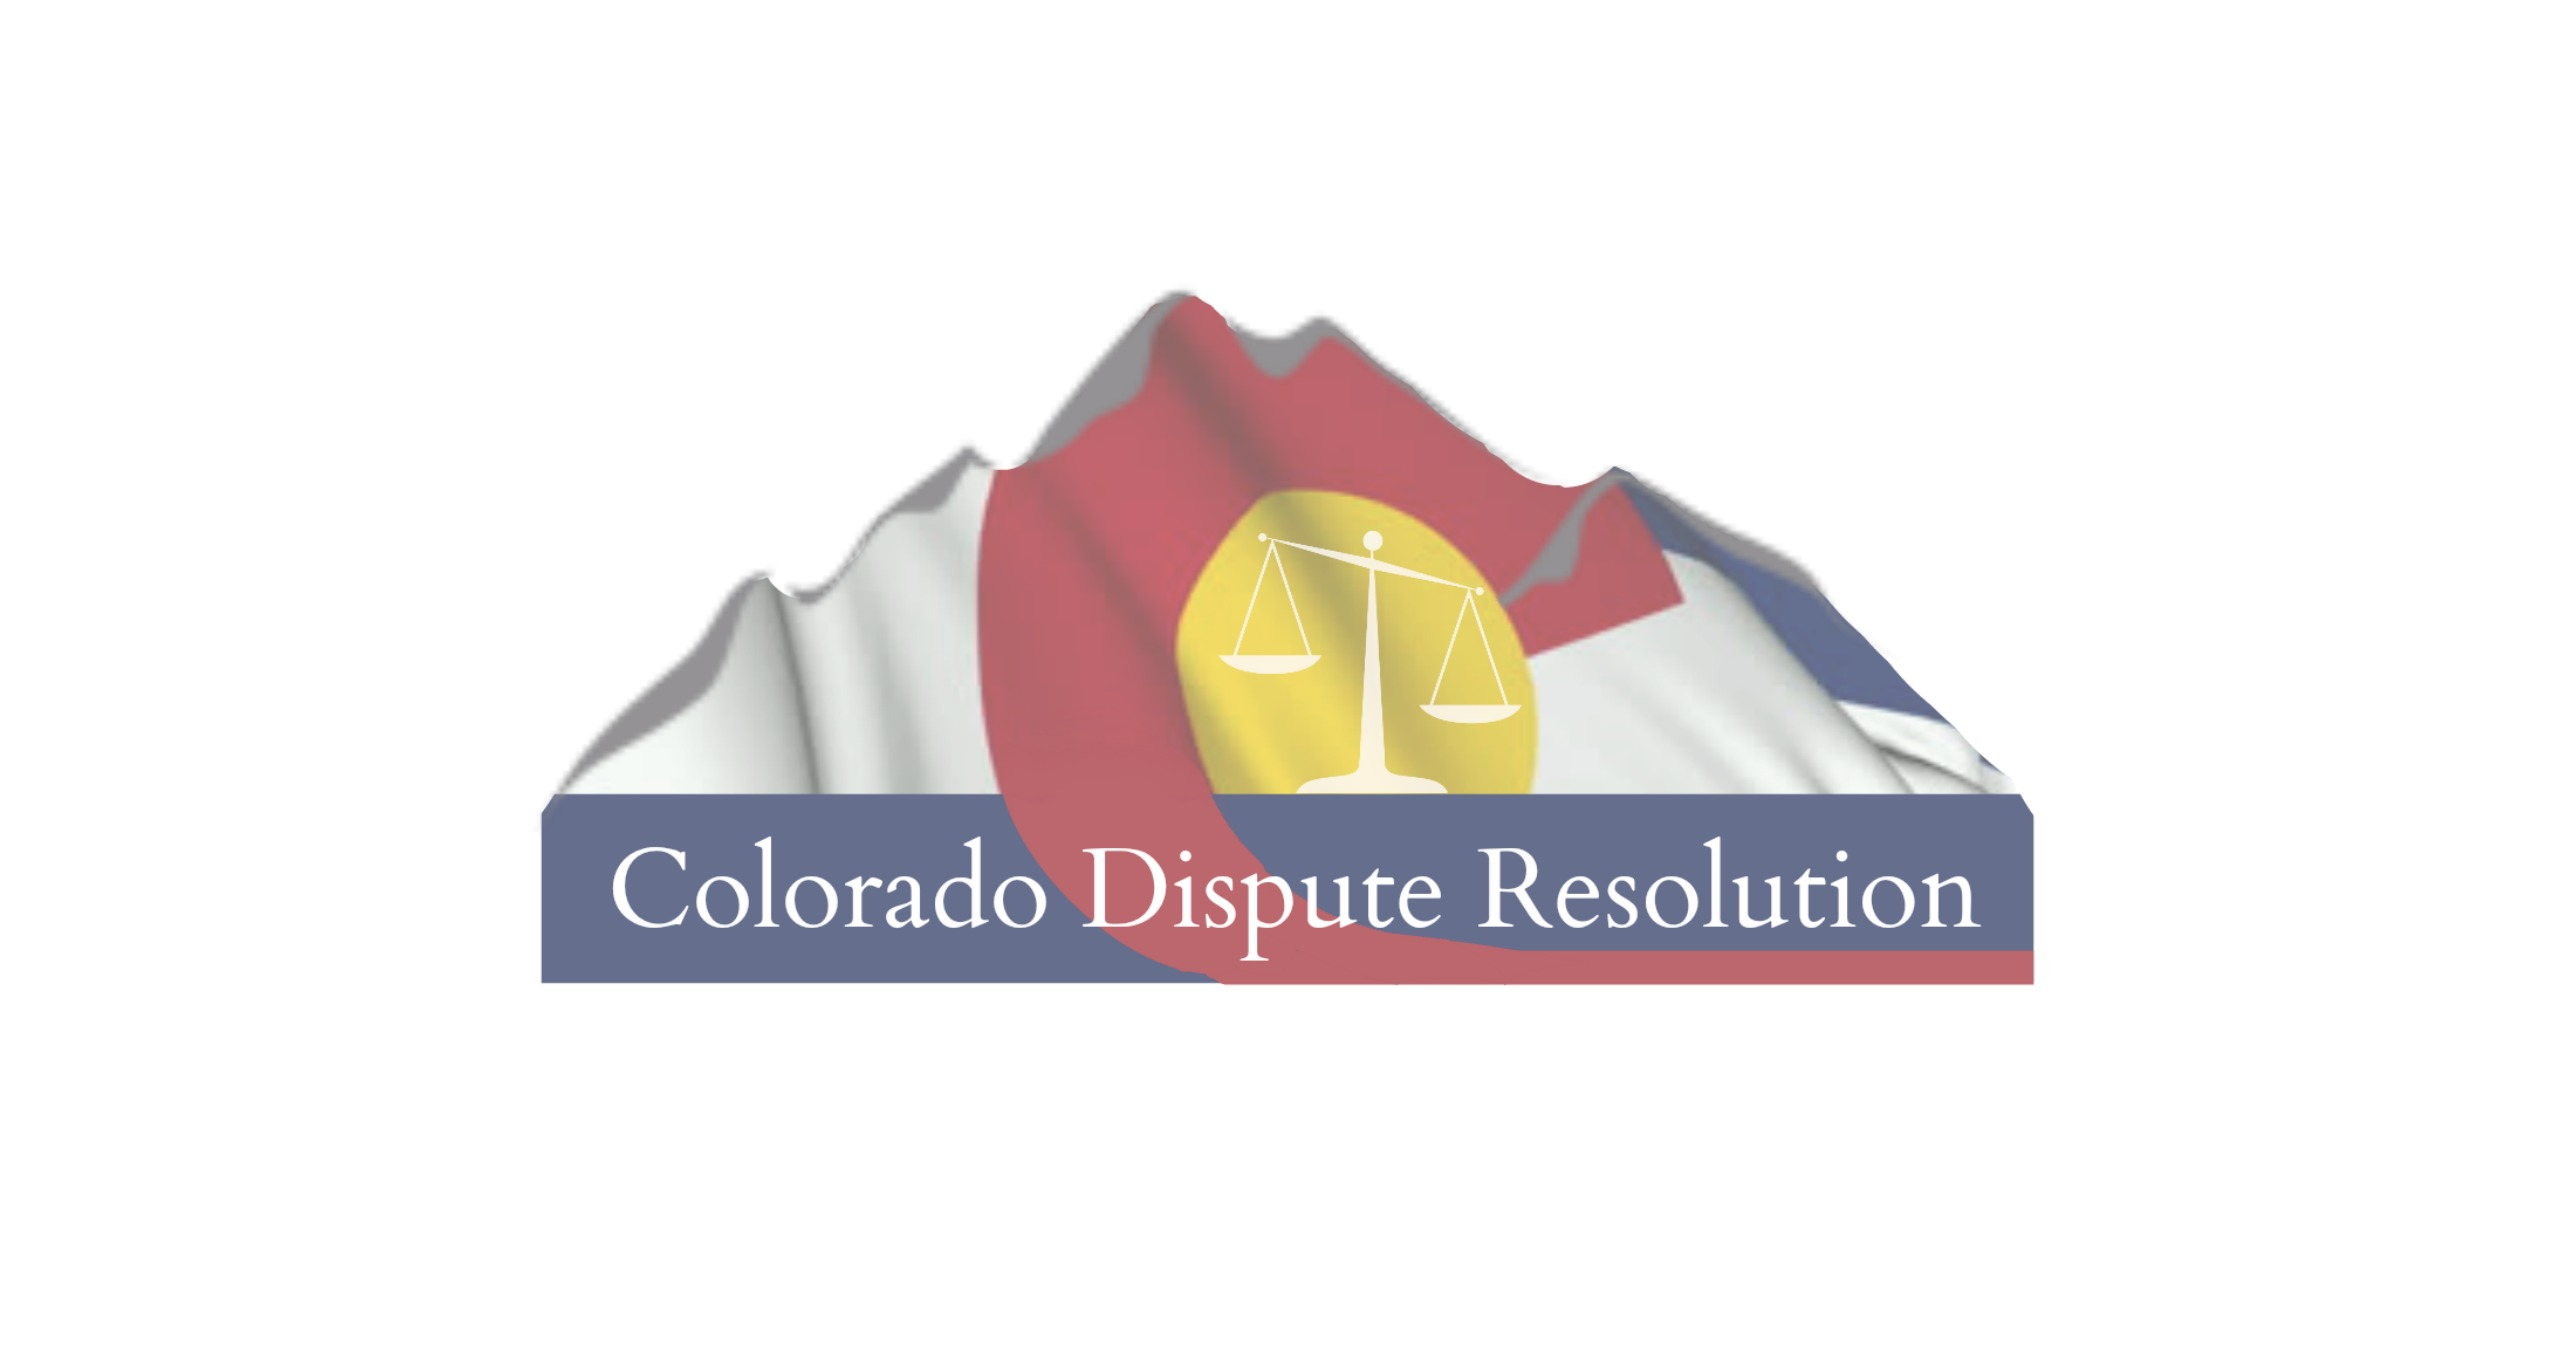 Colorado Dispute Resolution